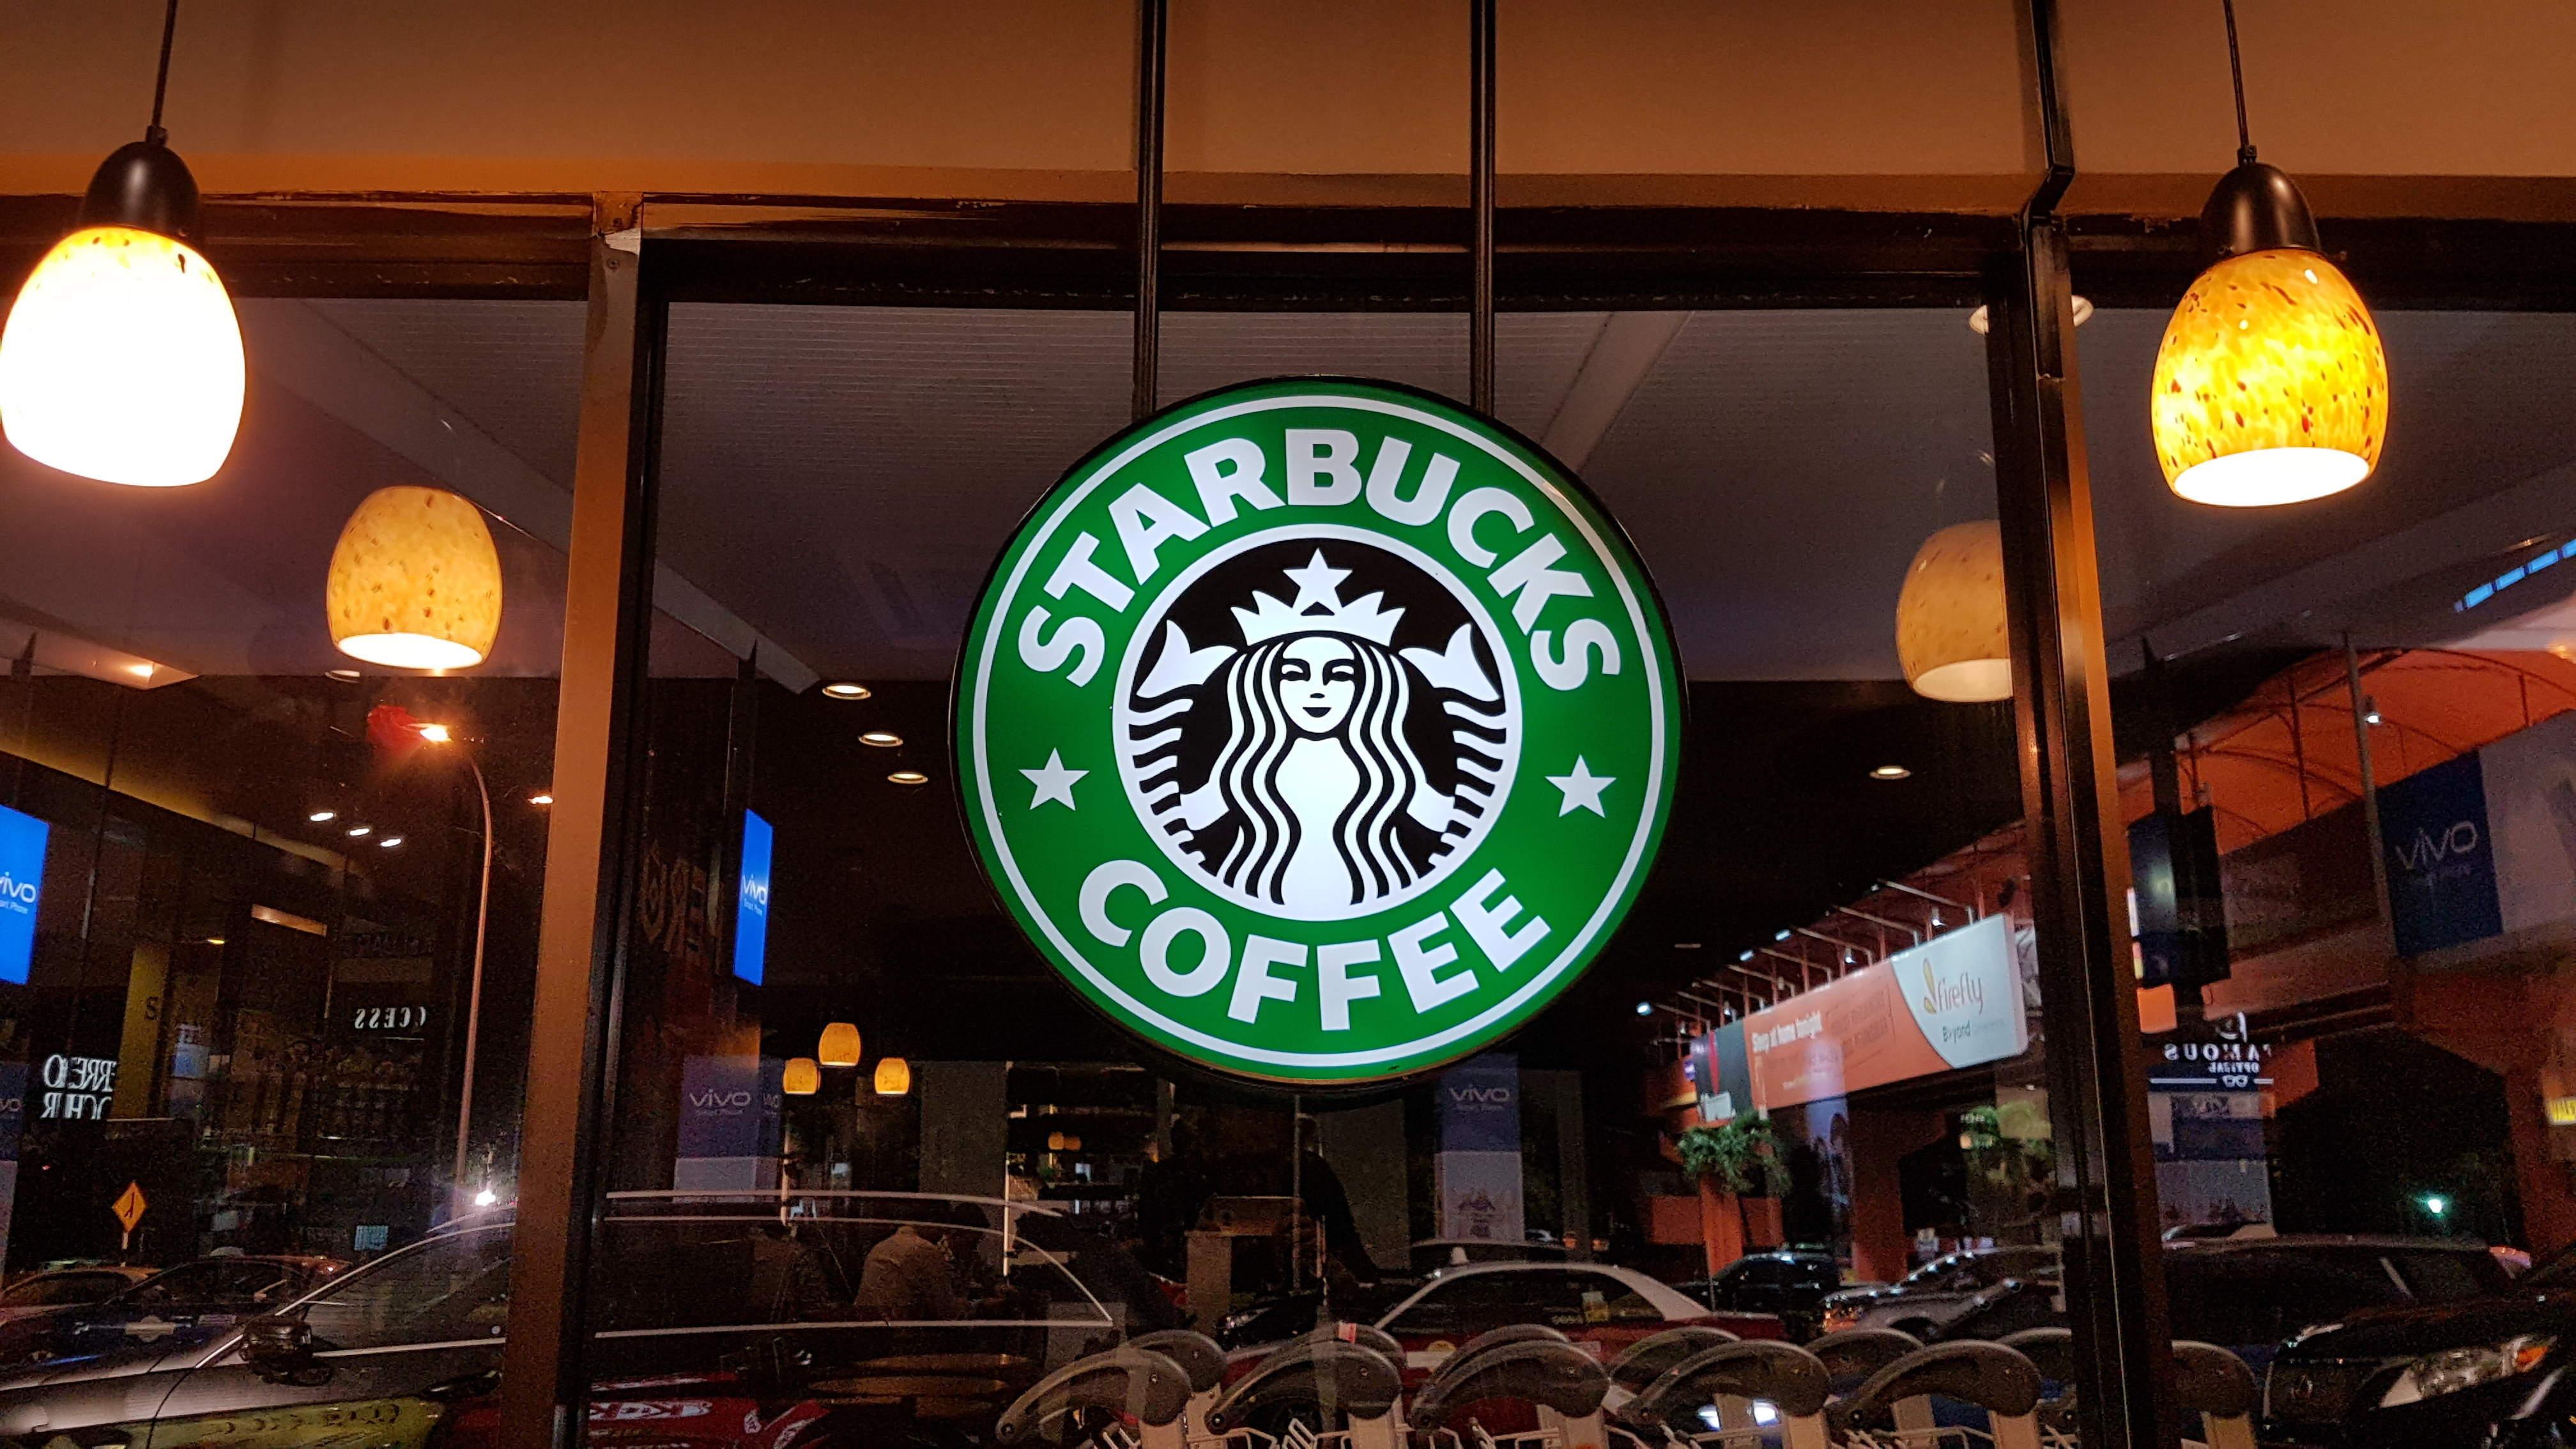 Can Starbucks' latest gimmick help boost its declining revenue?